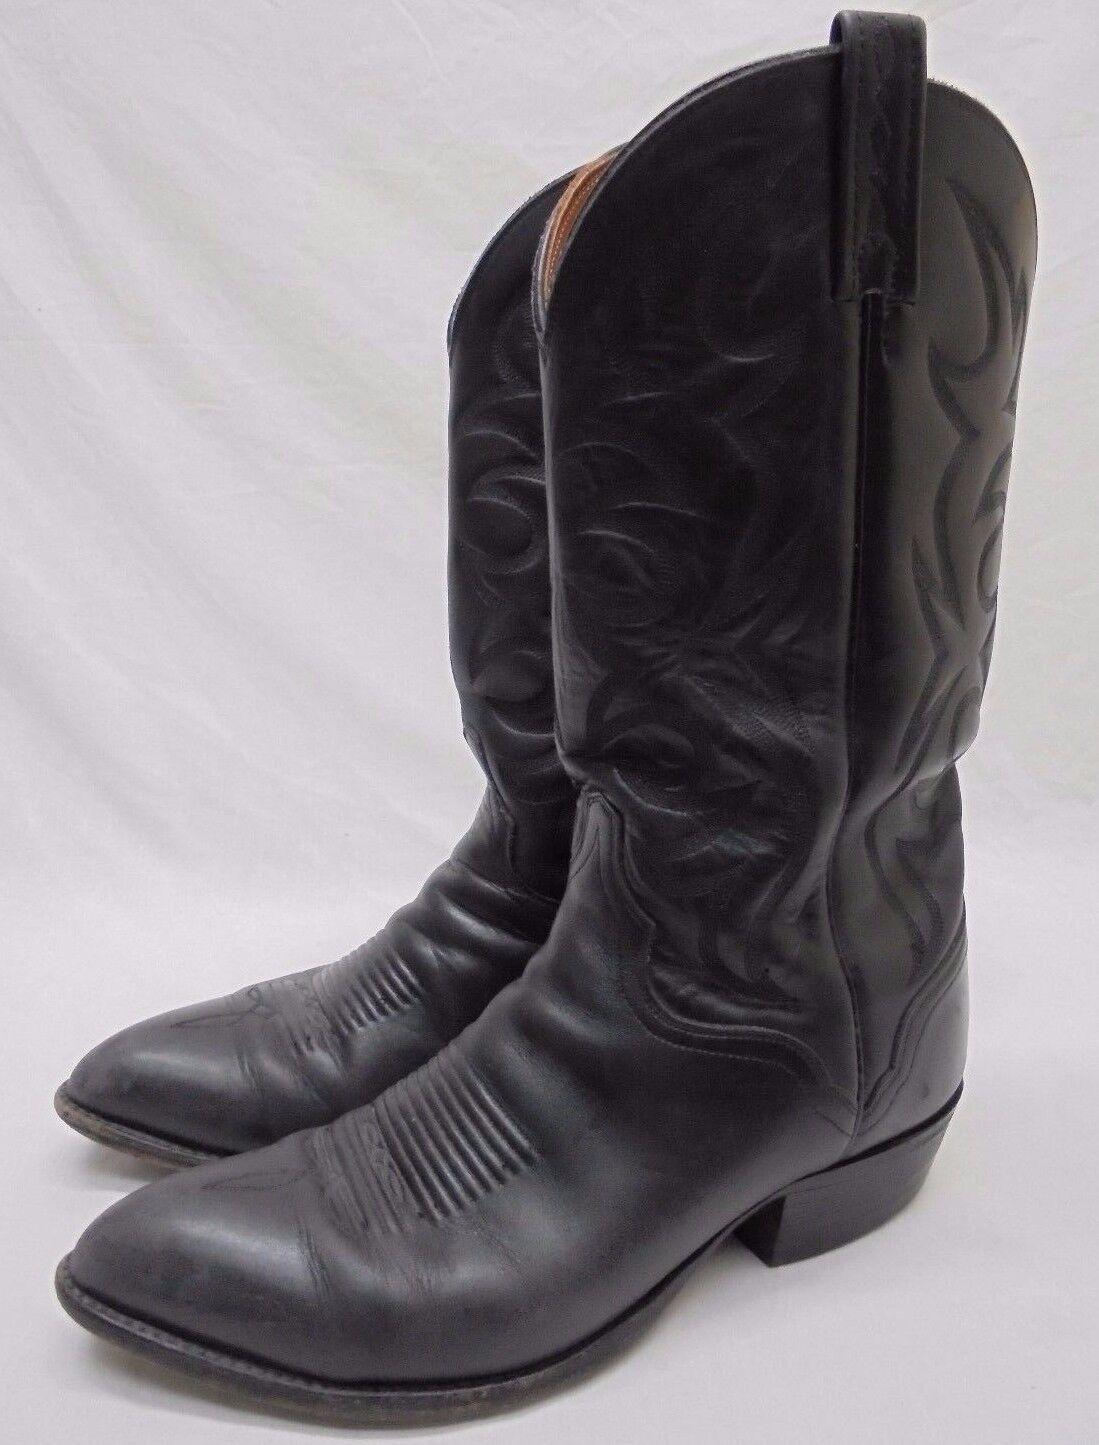 El Dorado Black Leather Tooled Cowboy Boots Size 10 EE Wide Western Handmade